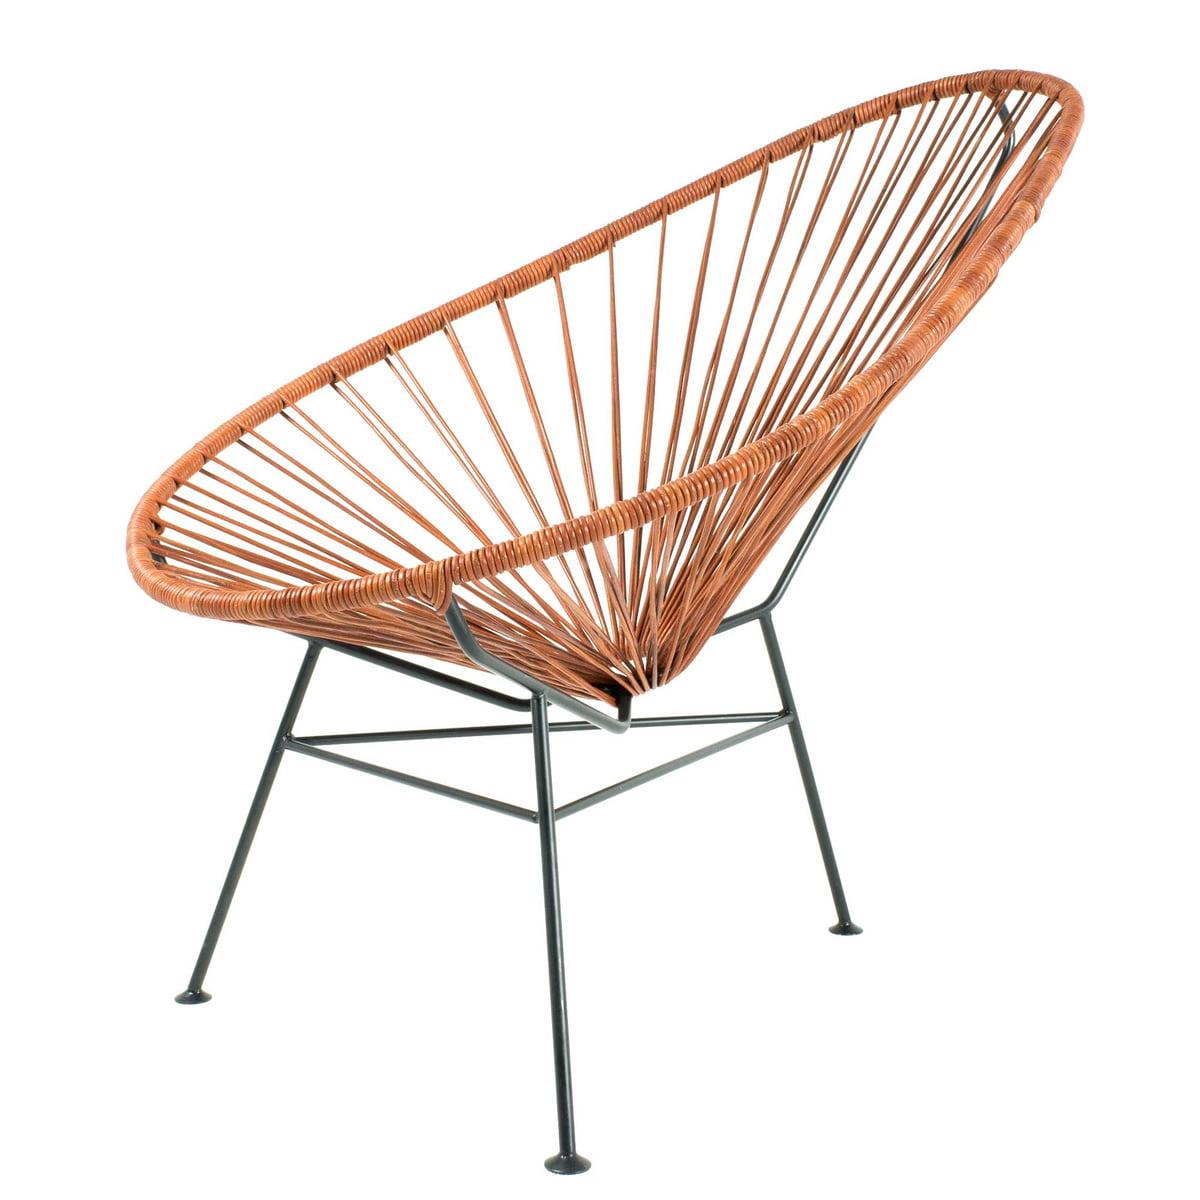 Le fauteuil acapulco cuir d 39 acapulco design - Fauteuil acapulco noir ...